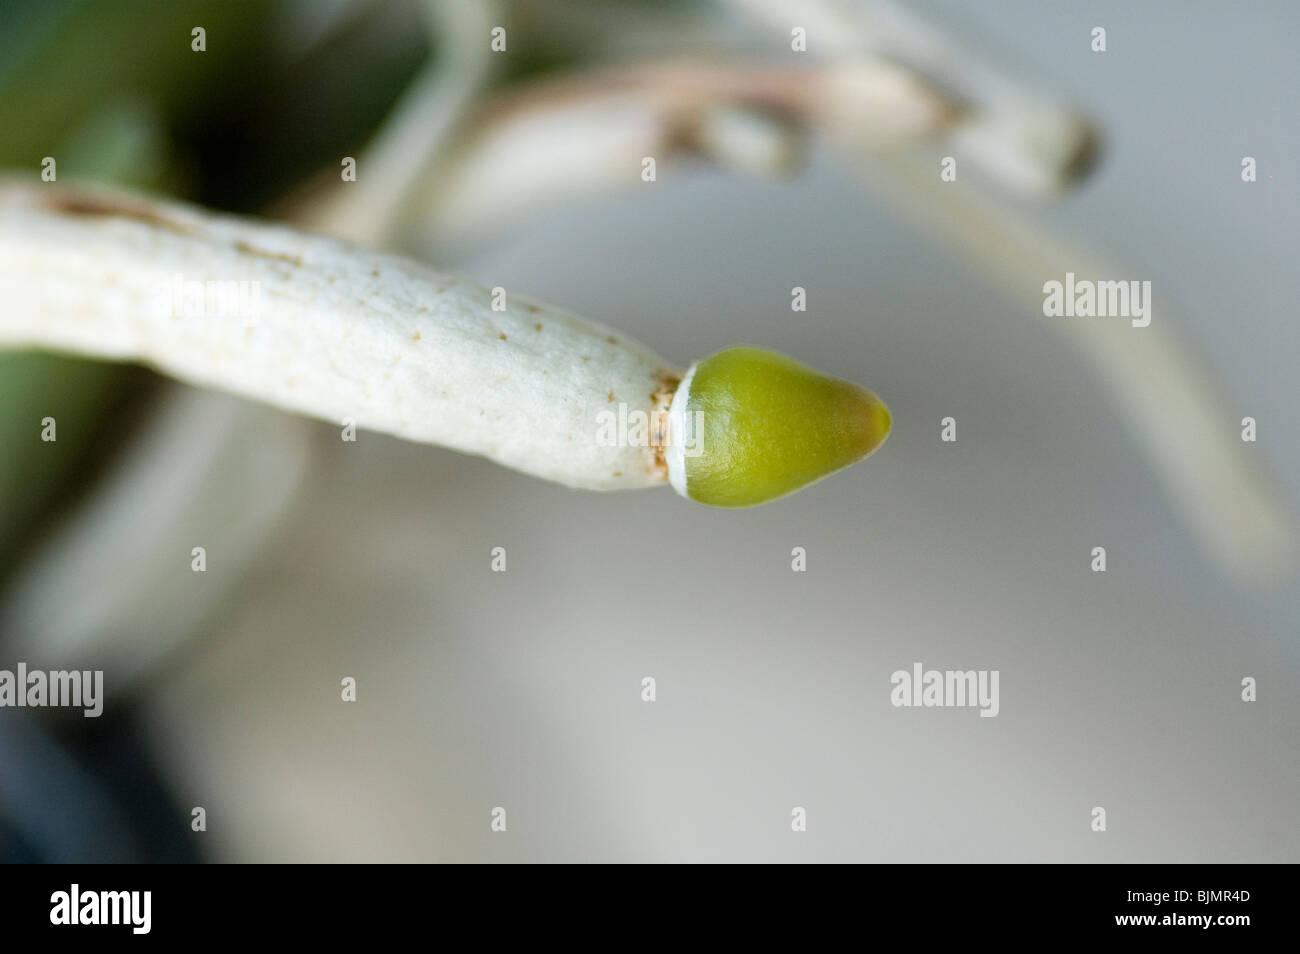 Root tip of Vasco Orchid - vanda x Ascocenda - showing new growth starting - Stock Image